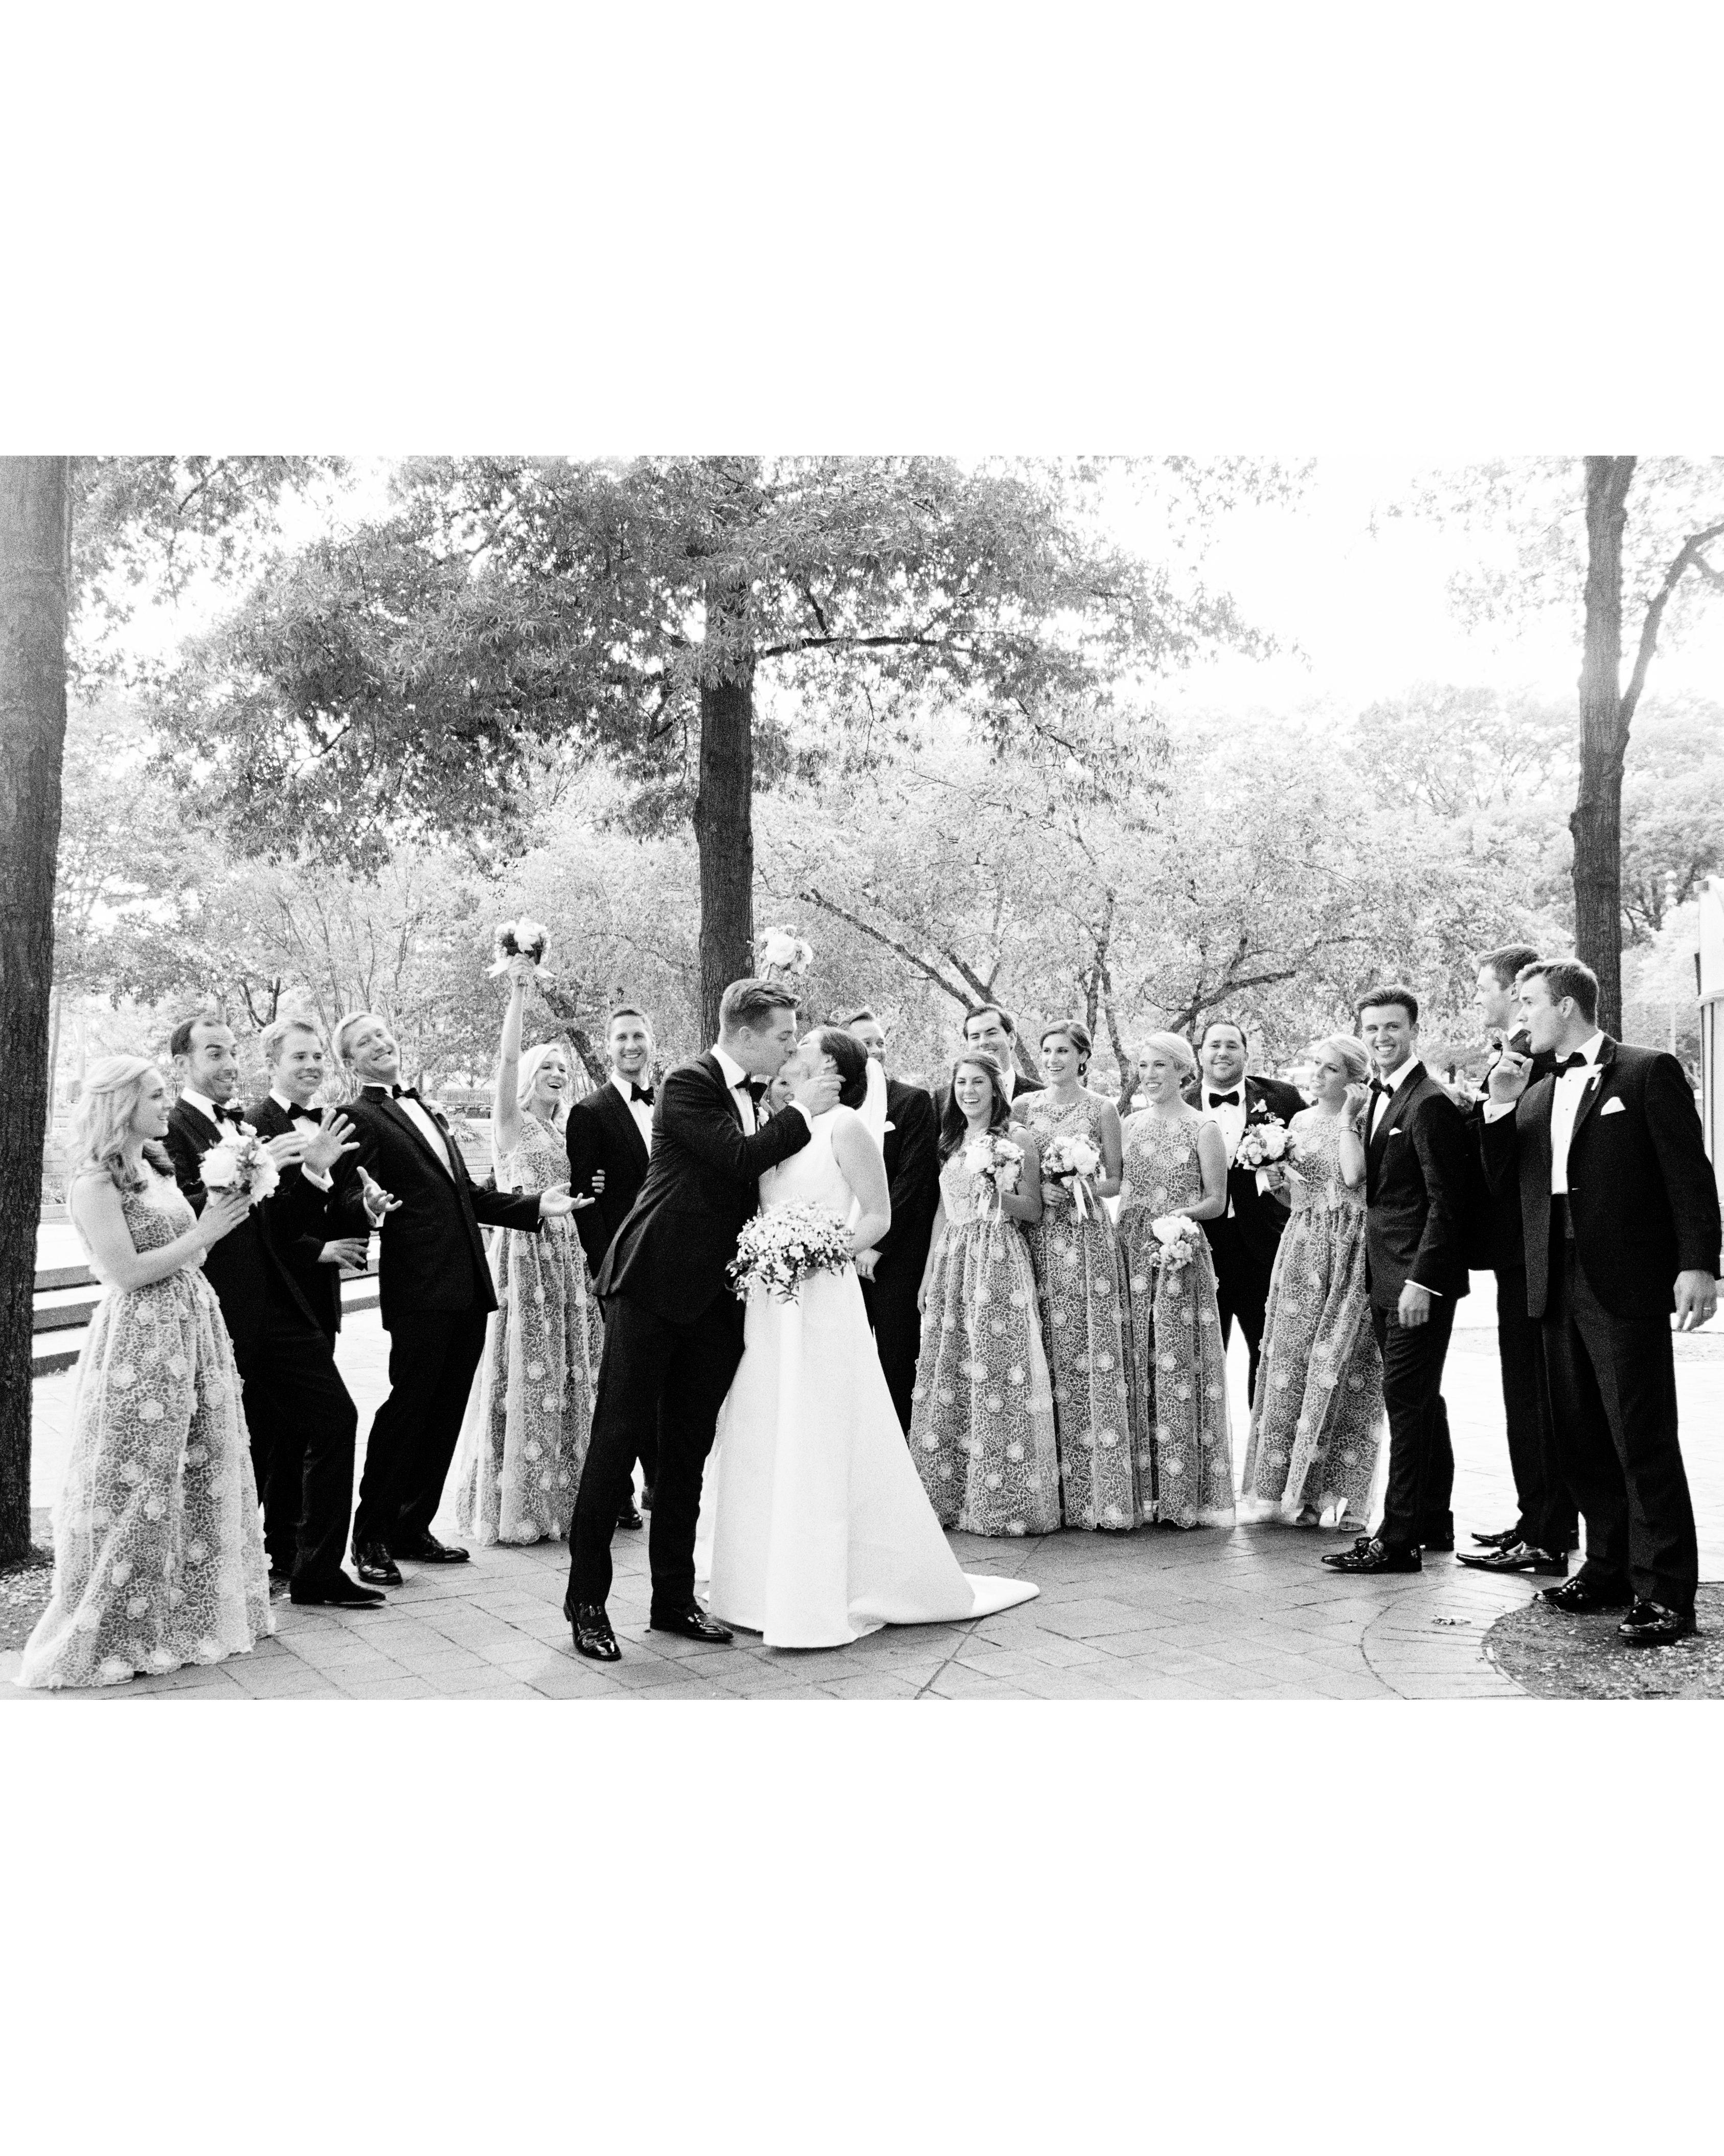 taylor-john-wedding-kiss-272-s112507-0116.jpg